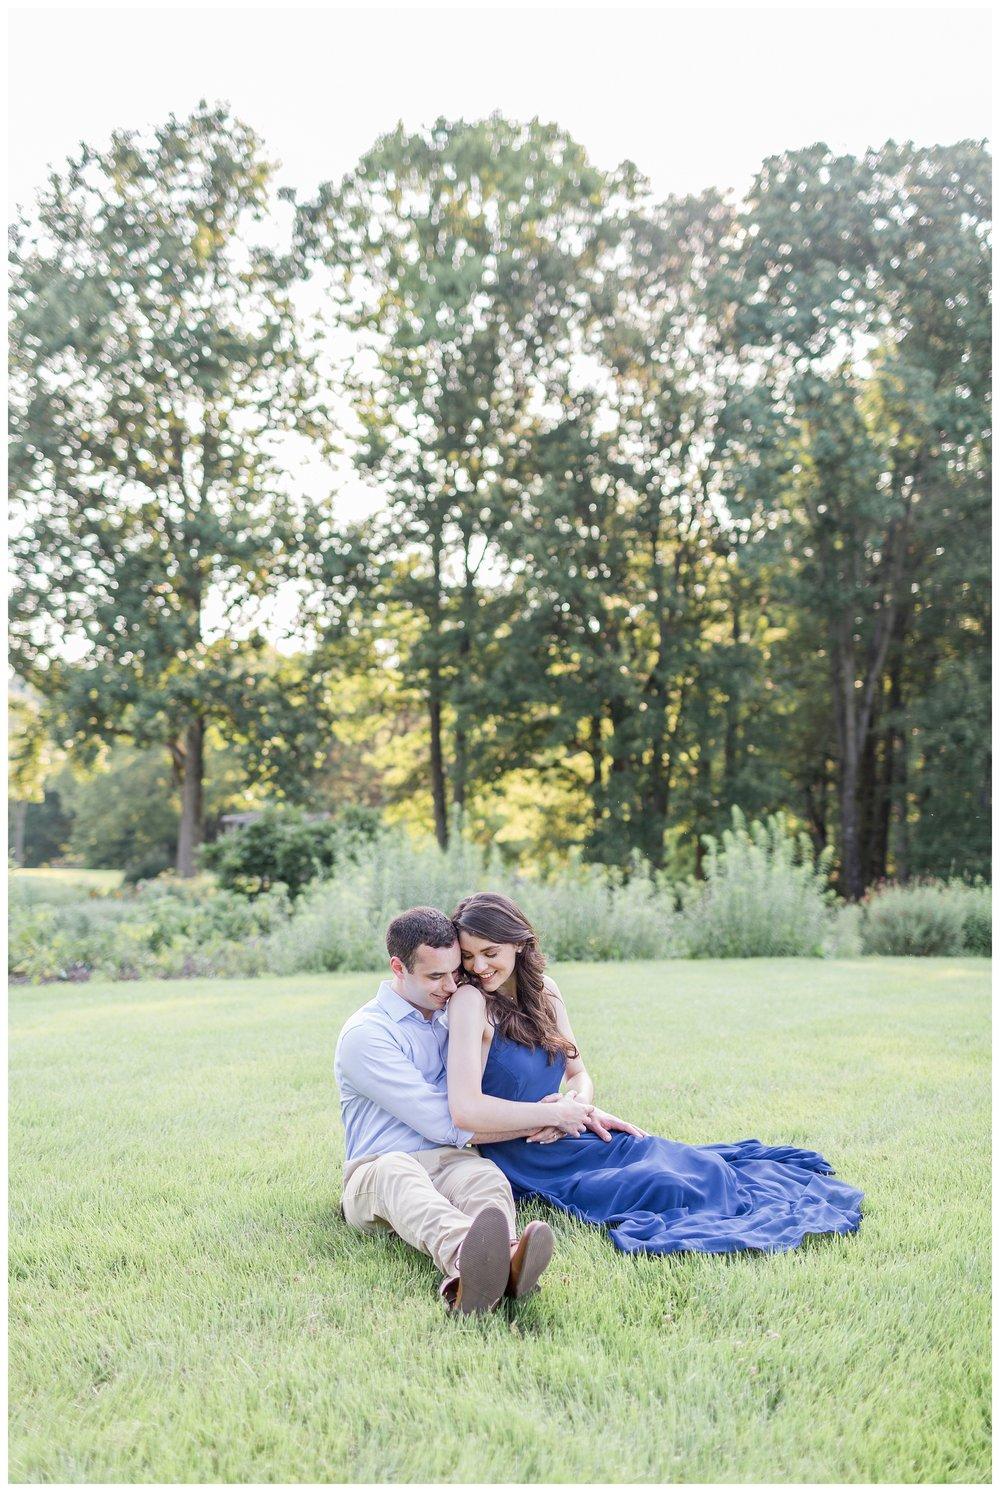 Meadowlark Botanical Garden Engagement | Virginia Wedding Photographer Kir Tuben_0034.jpg